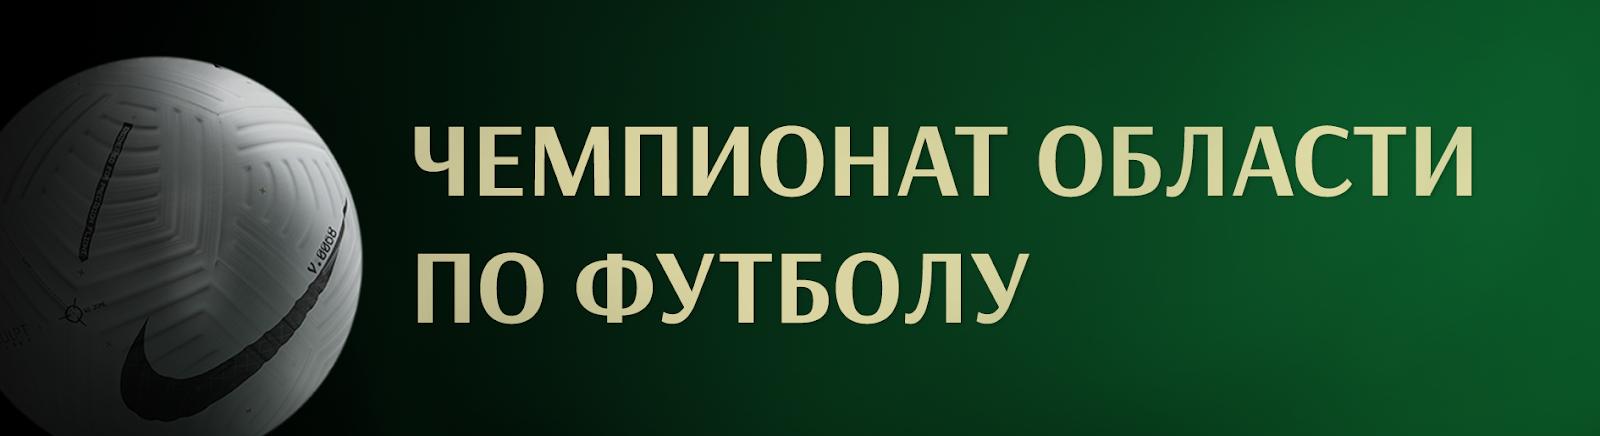 Чемпионат и Кубок области